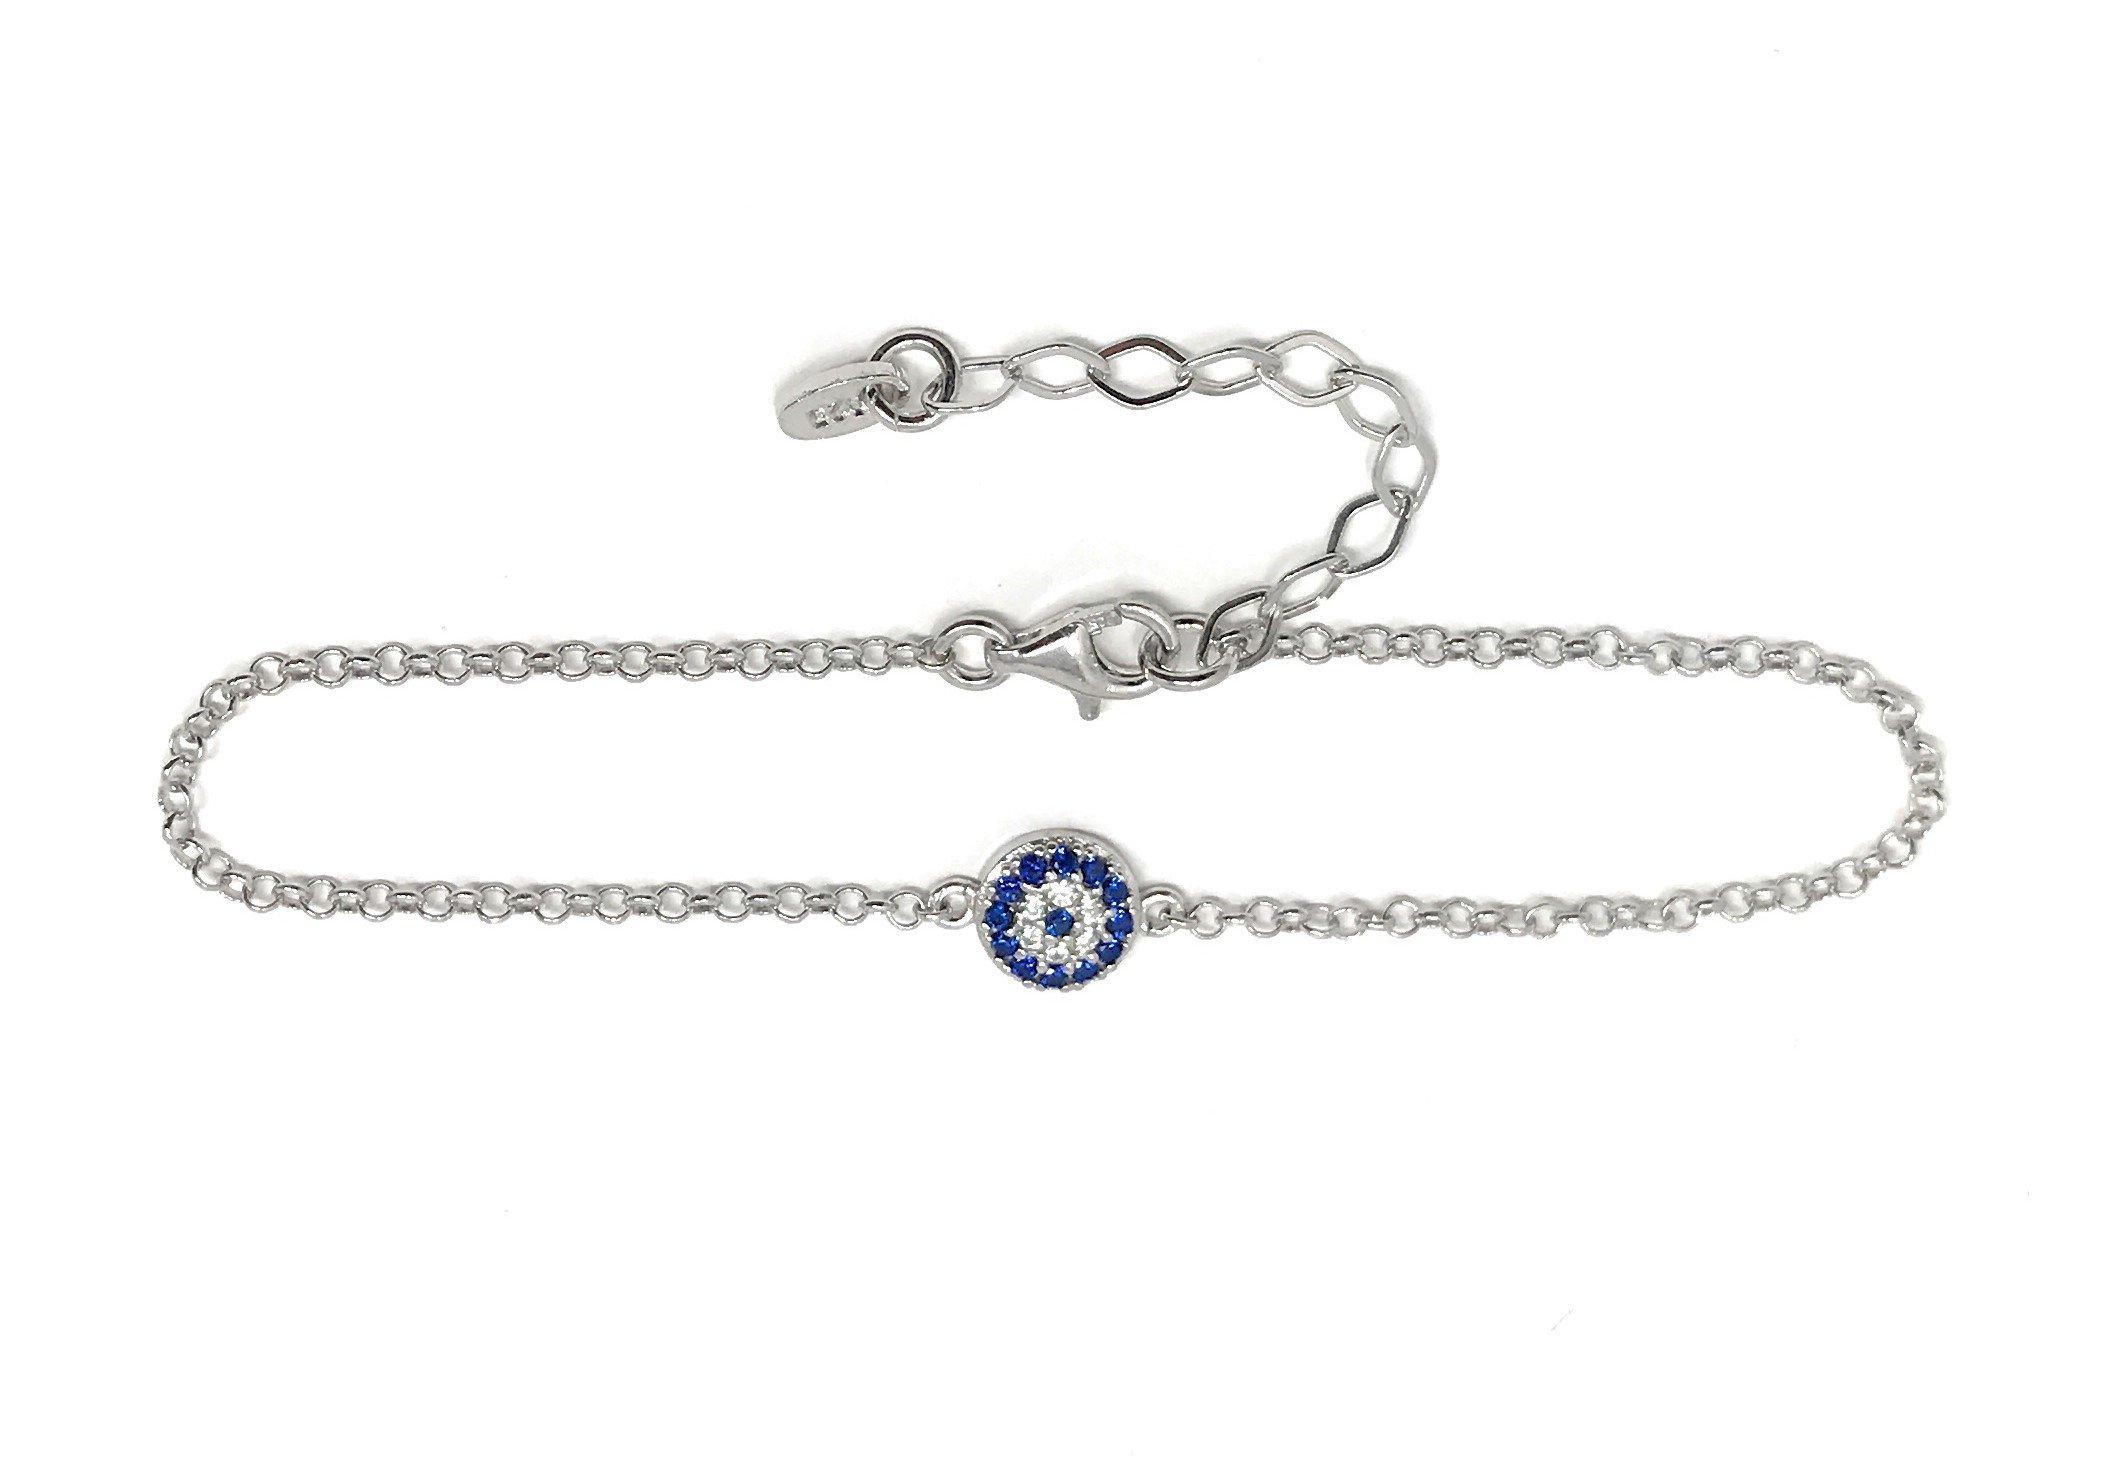 Martinuzzi Evil eye Chain Bracelet Sterling Silver Turkish Little Round Charm Zircon Crystals Good Luck Amulet (Sterling Silver)